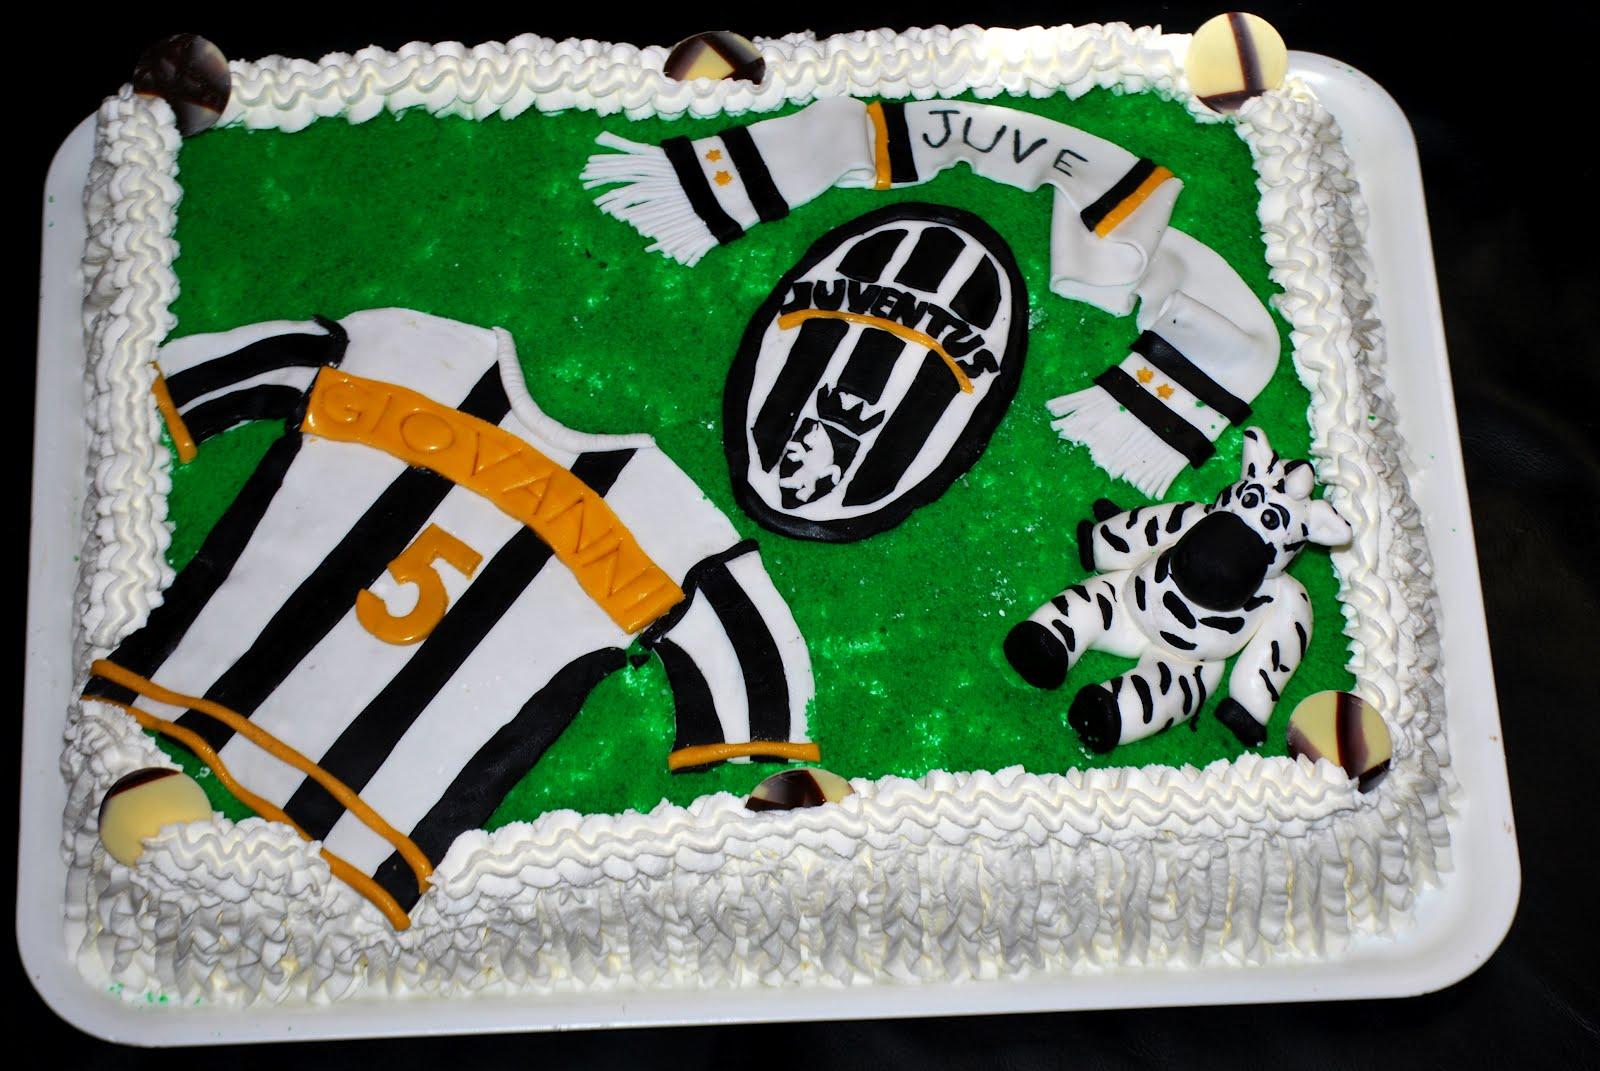 Célèbre Decorazioni Torta Juventus: Verys cake: zebra juve beffarda. CL35